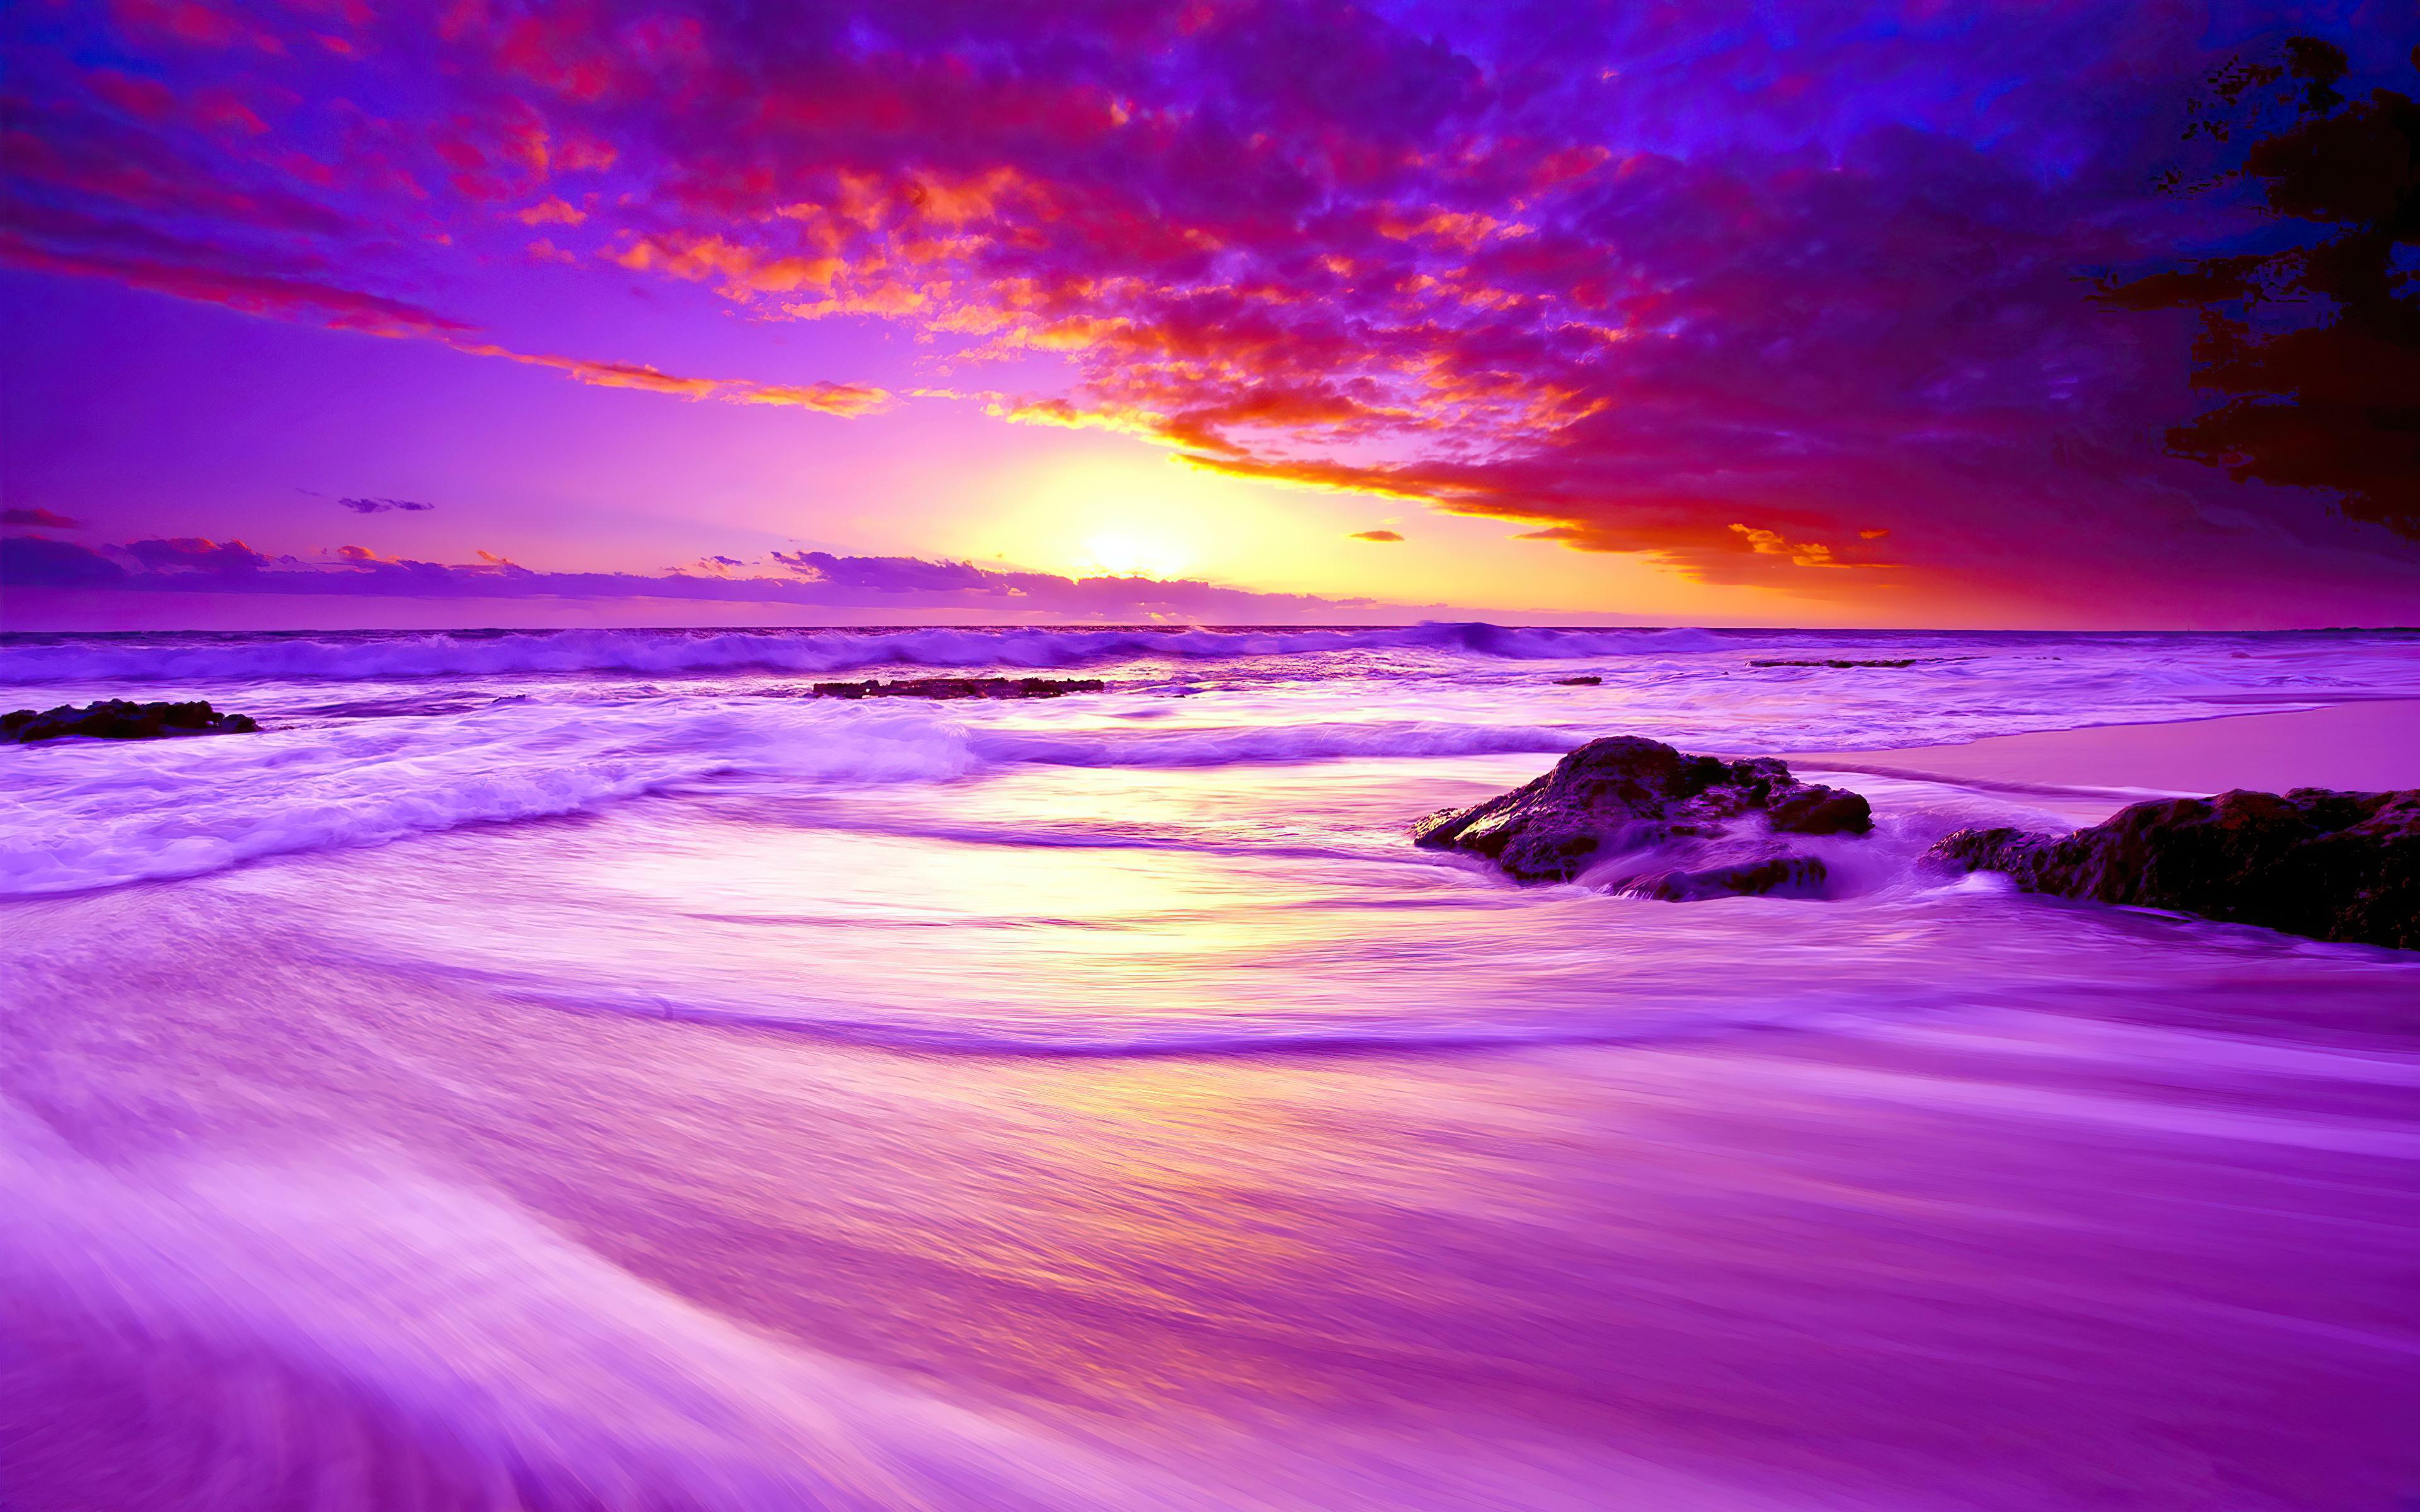 purple beach sunset 4k 1602504544 - Purple Beach Sunset 4k - Purple Beach Sunset 4k wallpapers